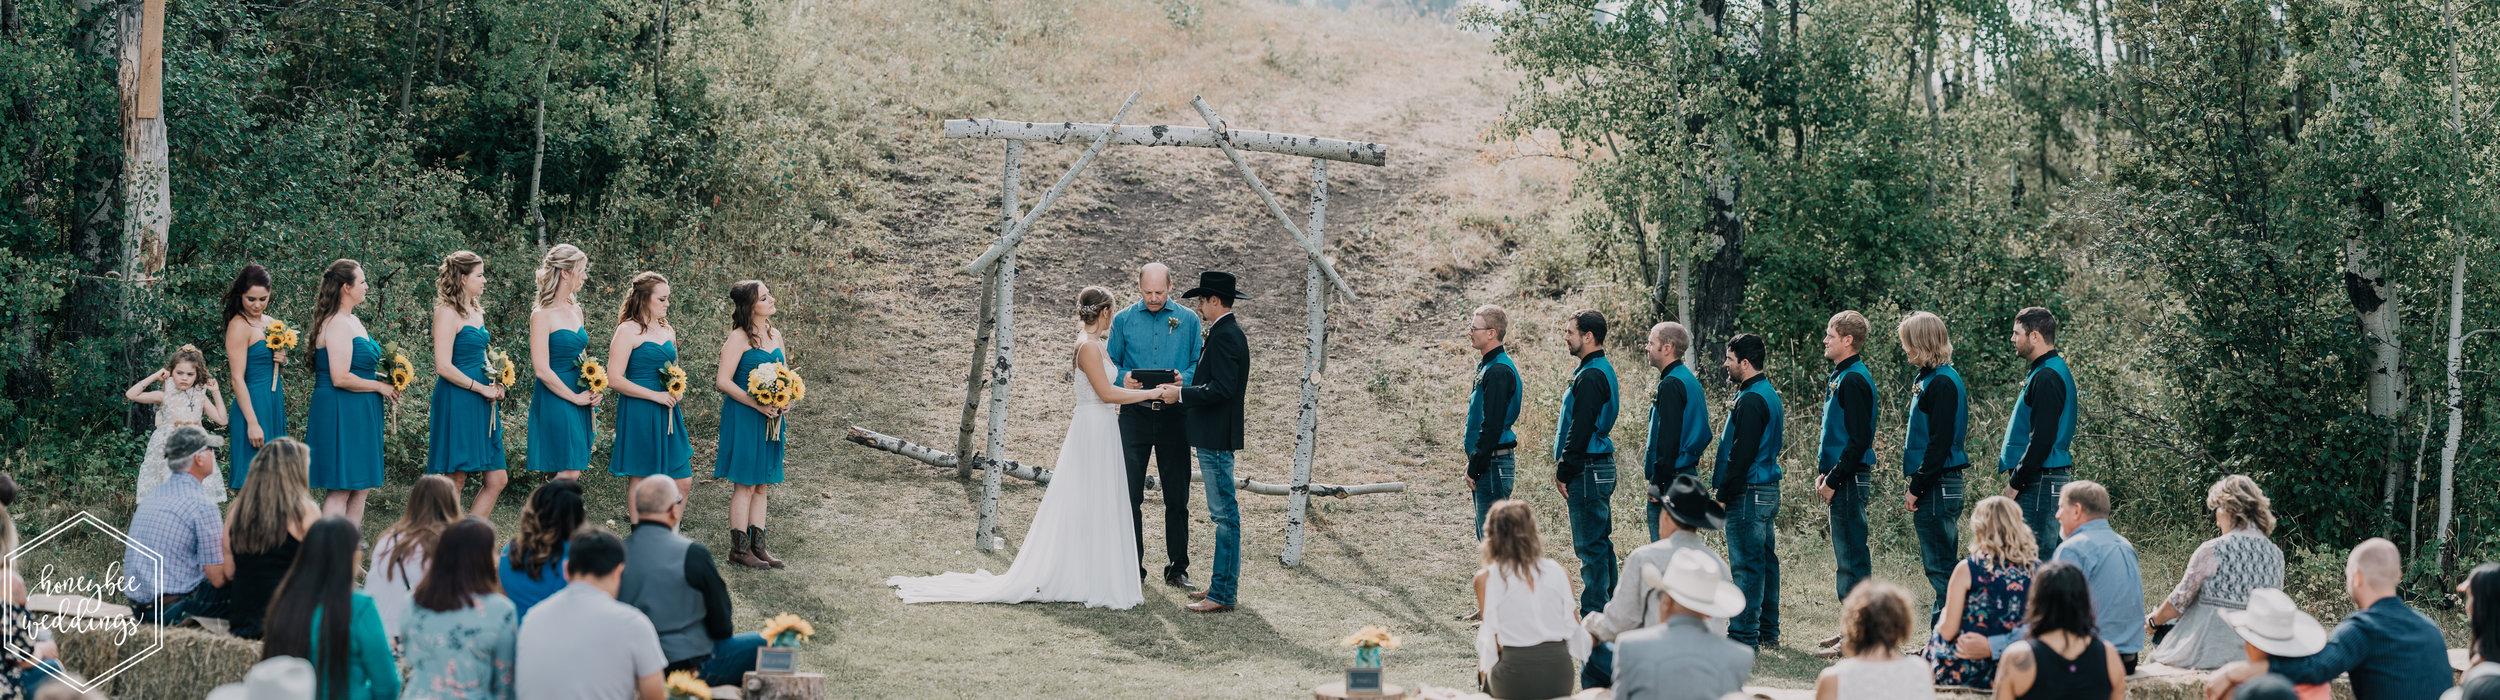 0004Havre Wedding_Ranch Wedding_Montana Wedding Photographer_Katlyn Kenyon + Jade Nystrom_August 25, 2018-1505-Pano.jpg